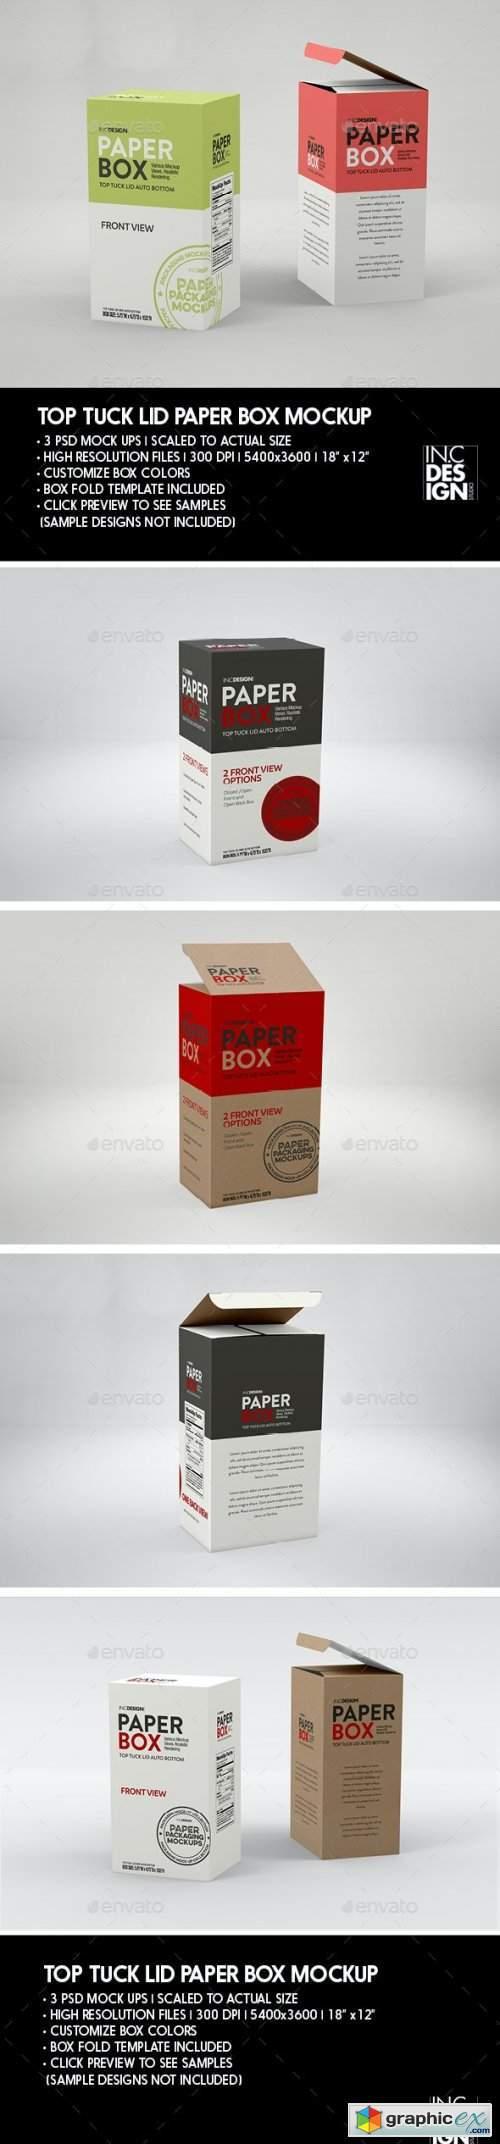 Paper Top Lid Tuck Box Packaging Mockup